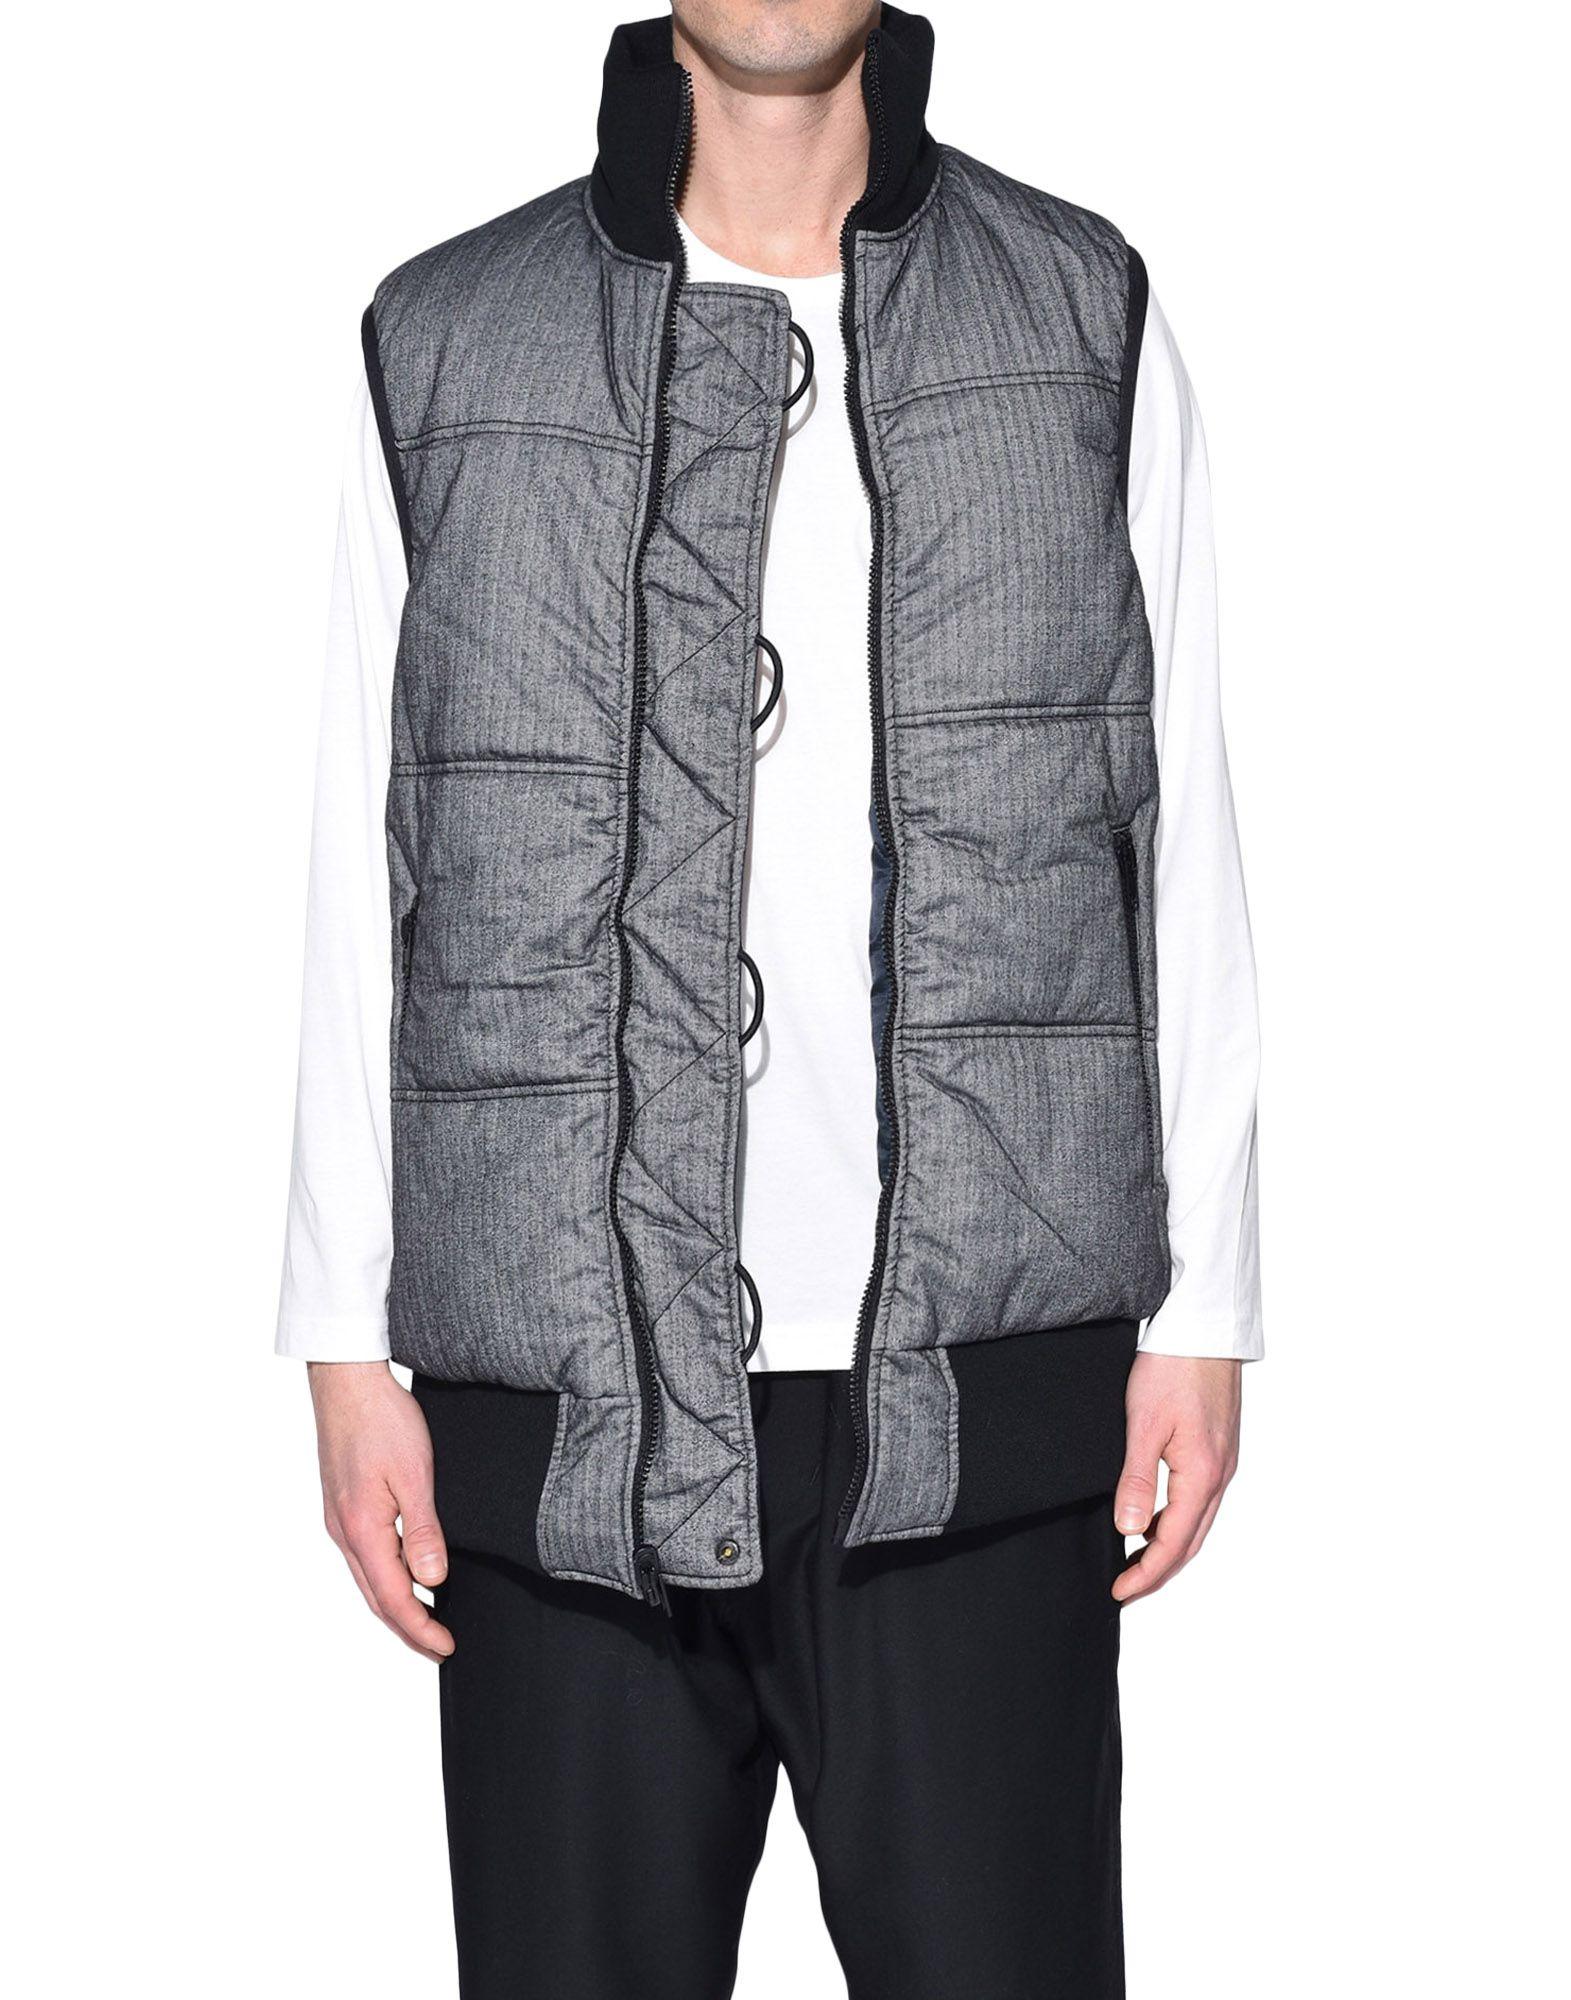 Y-3 Y-3 Oversize Reversible Vest ベスト メンズ r